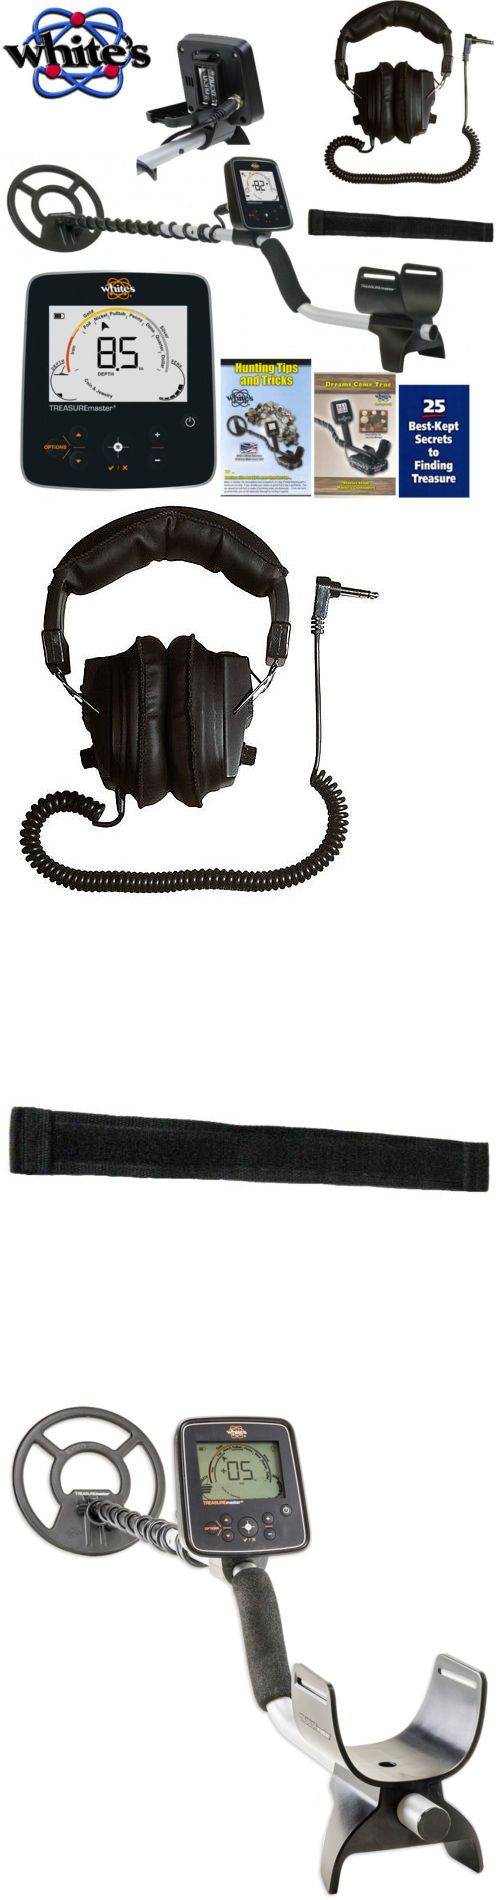 Metal Detectors: Whites Treasuremaster Metal Detector Waterproof Search Coil And Headphones BUY IT NOW ONLY: $279.0